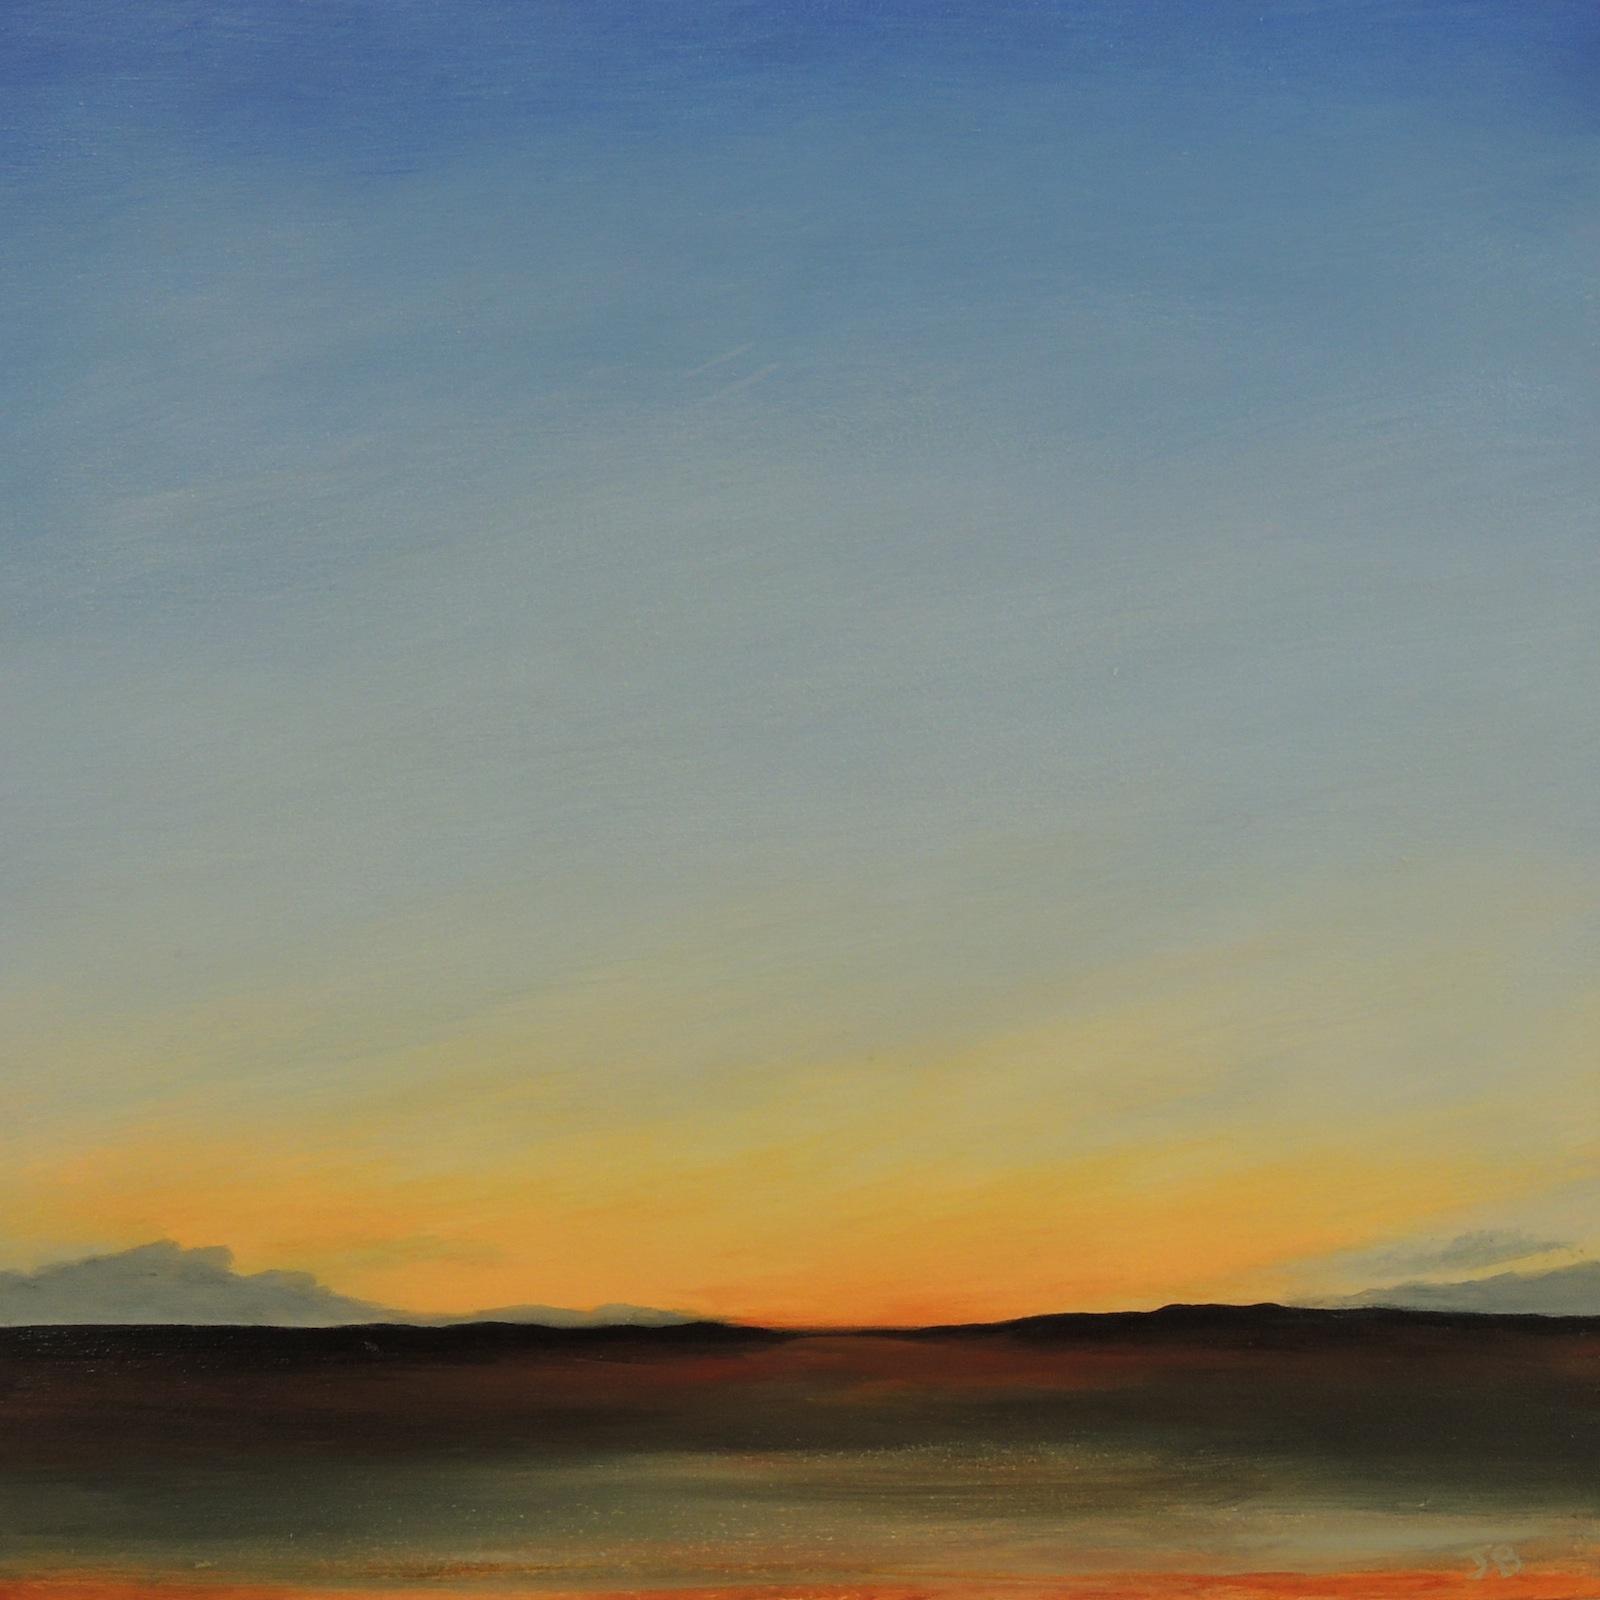 beyond-horizon-2-12x12-2014